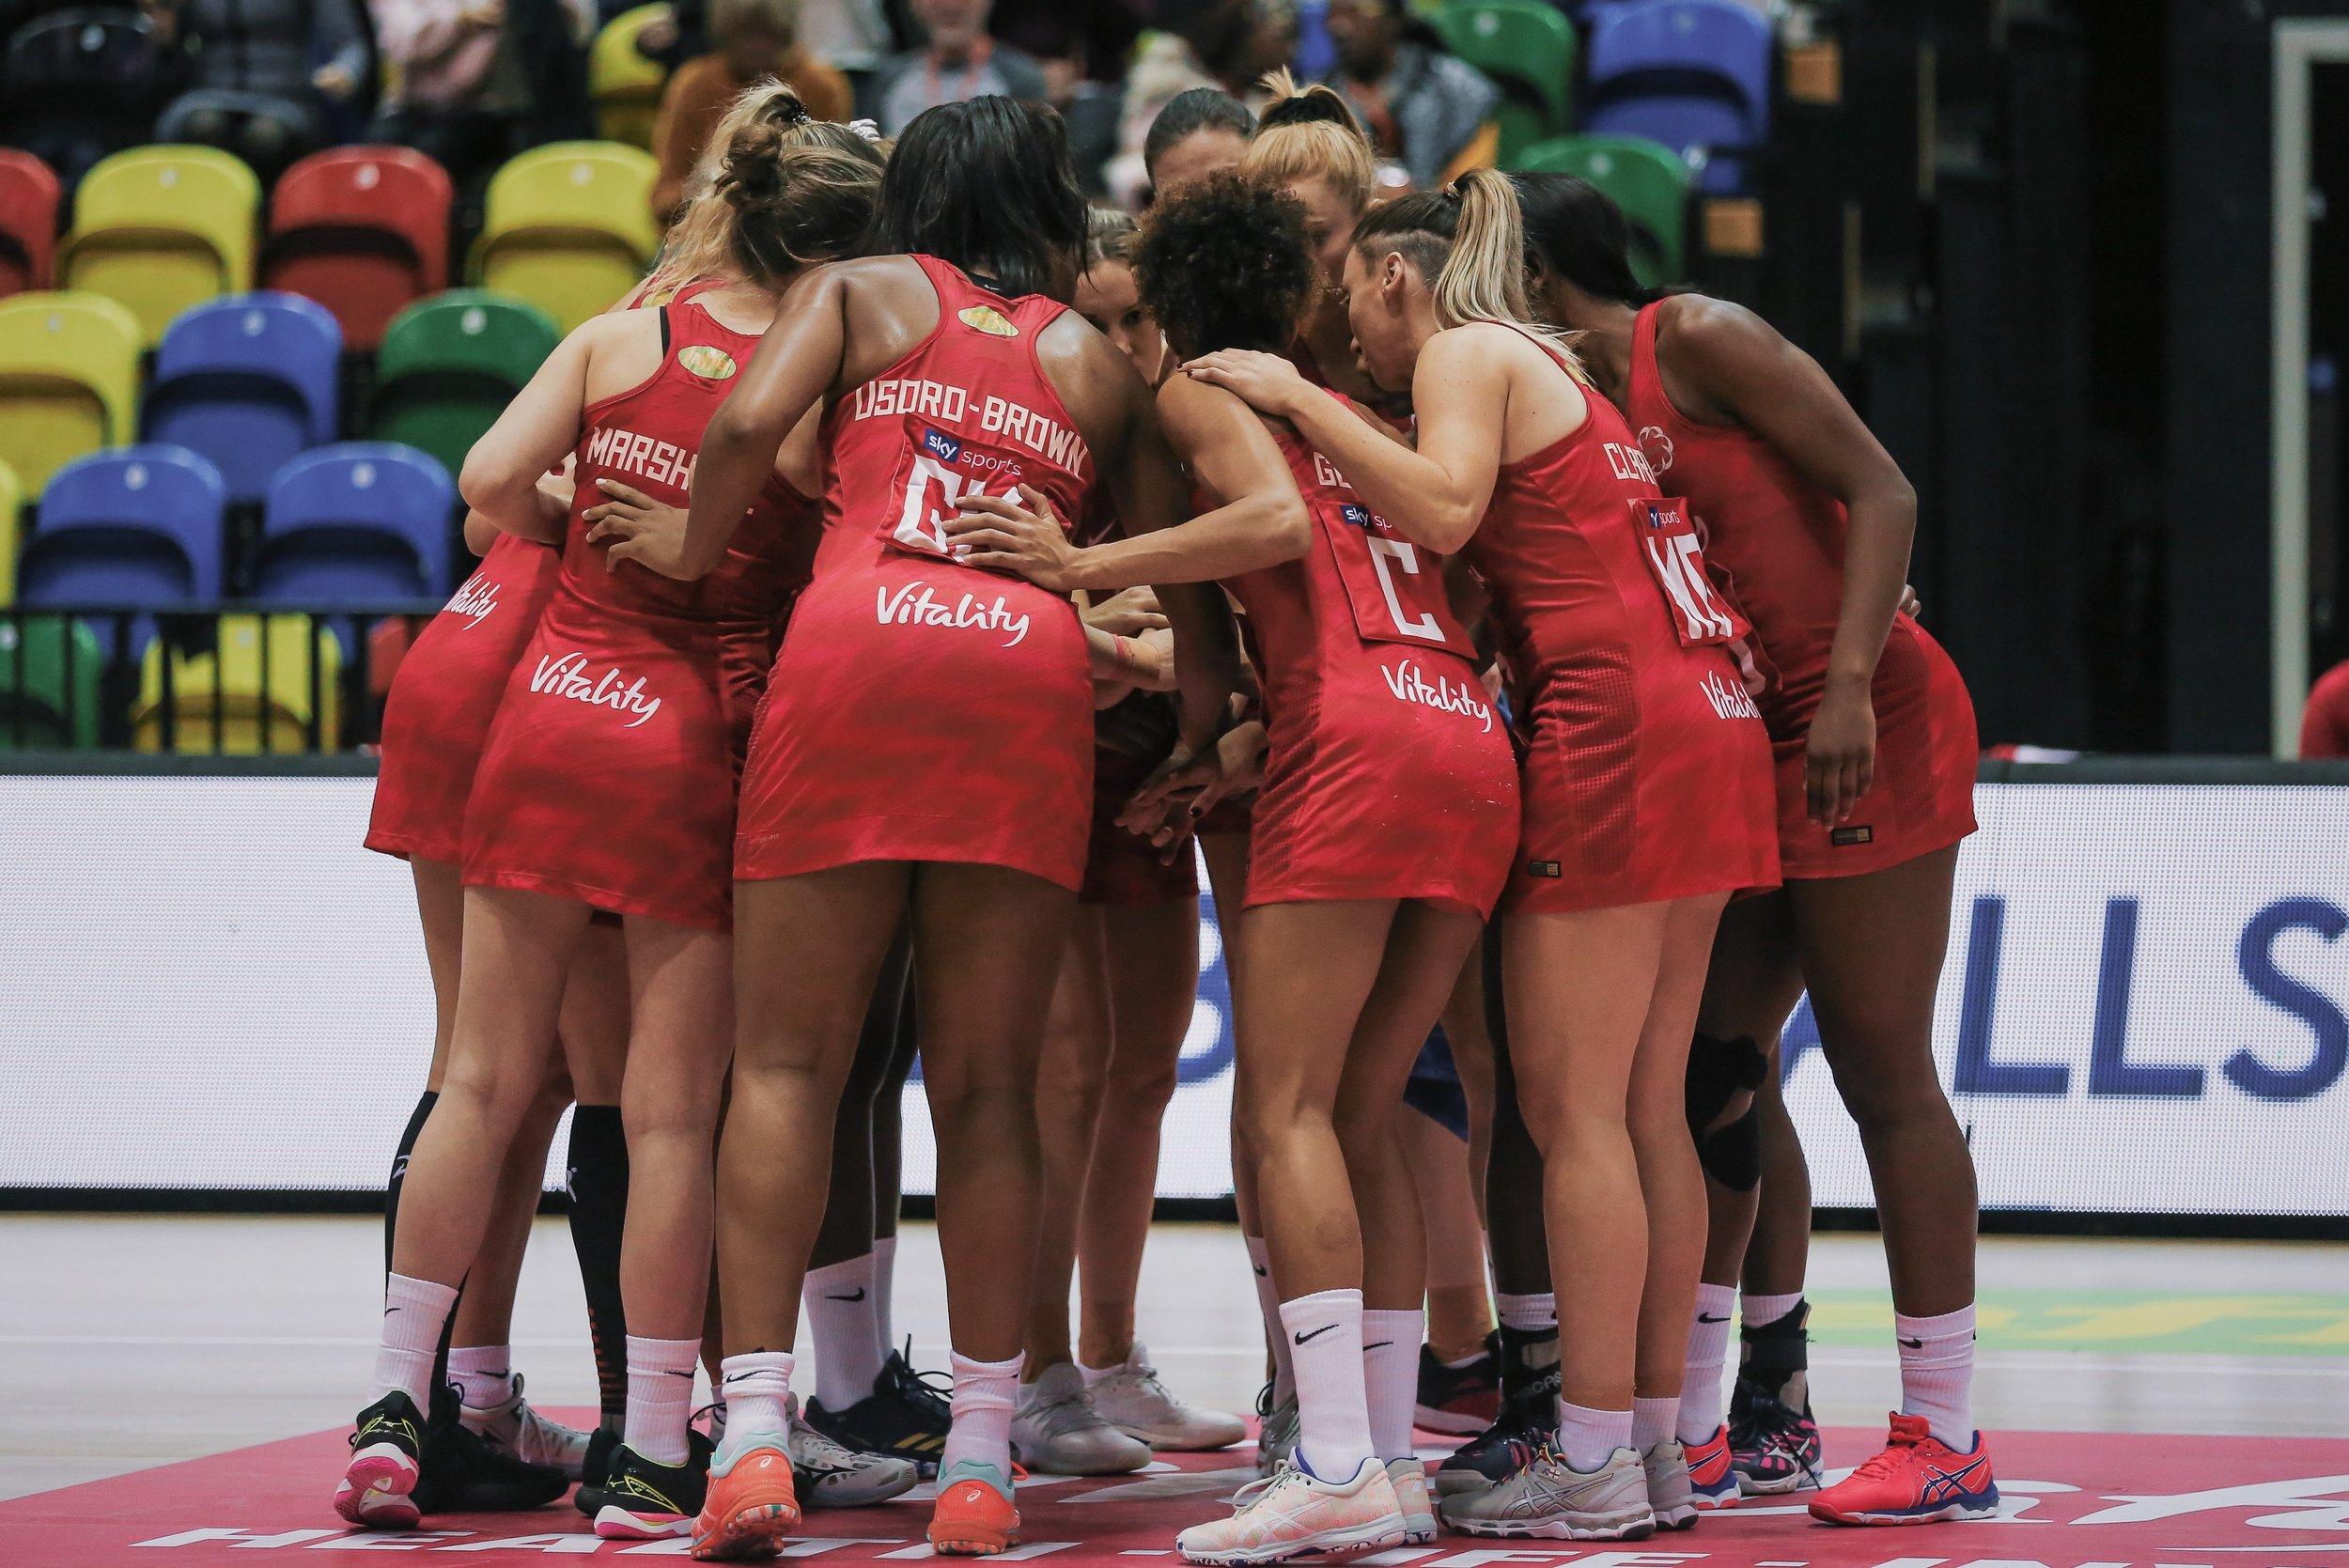 womens-netball-sport-england-uganda-international-series-02.jpg